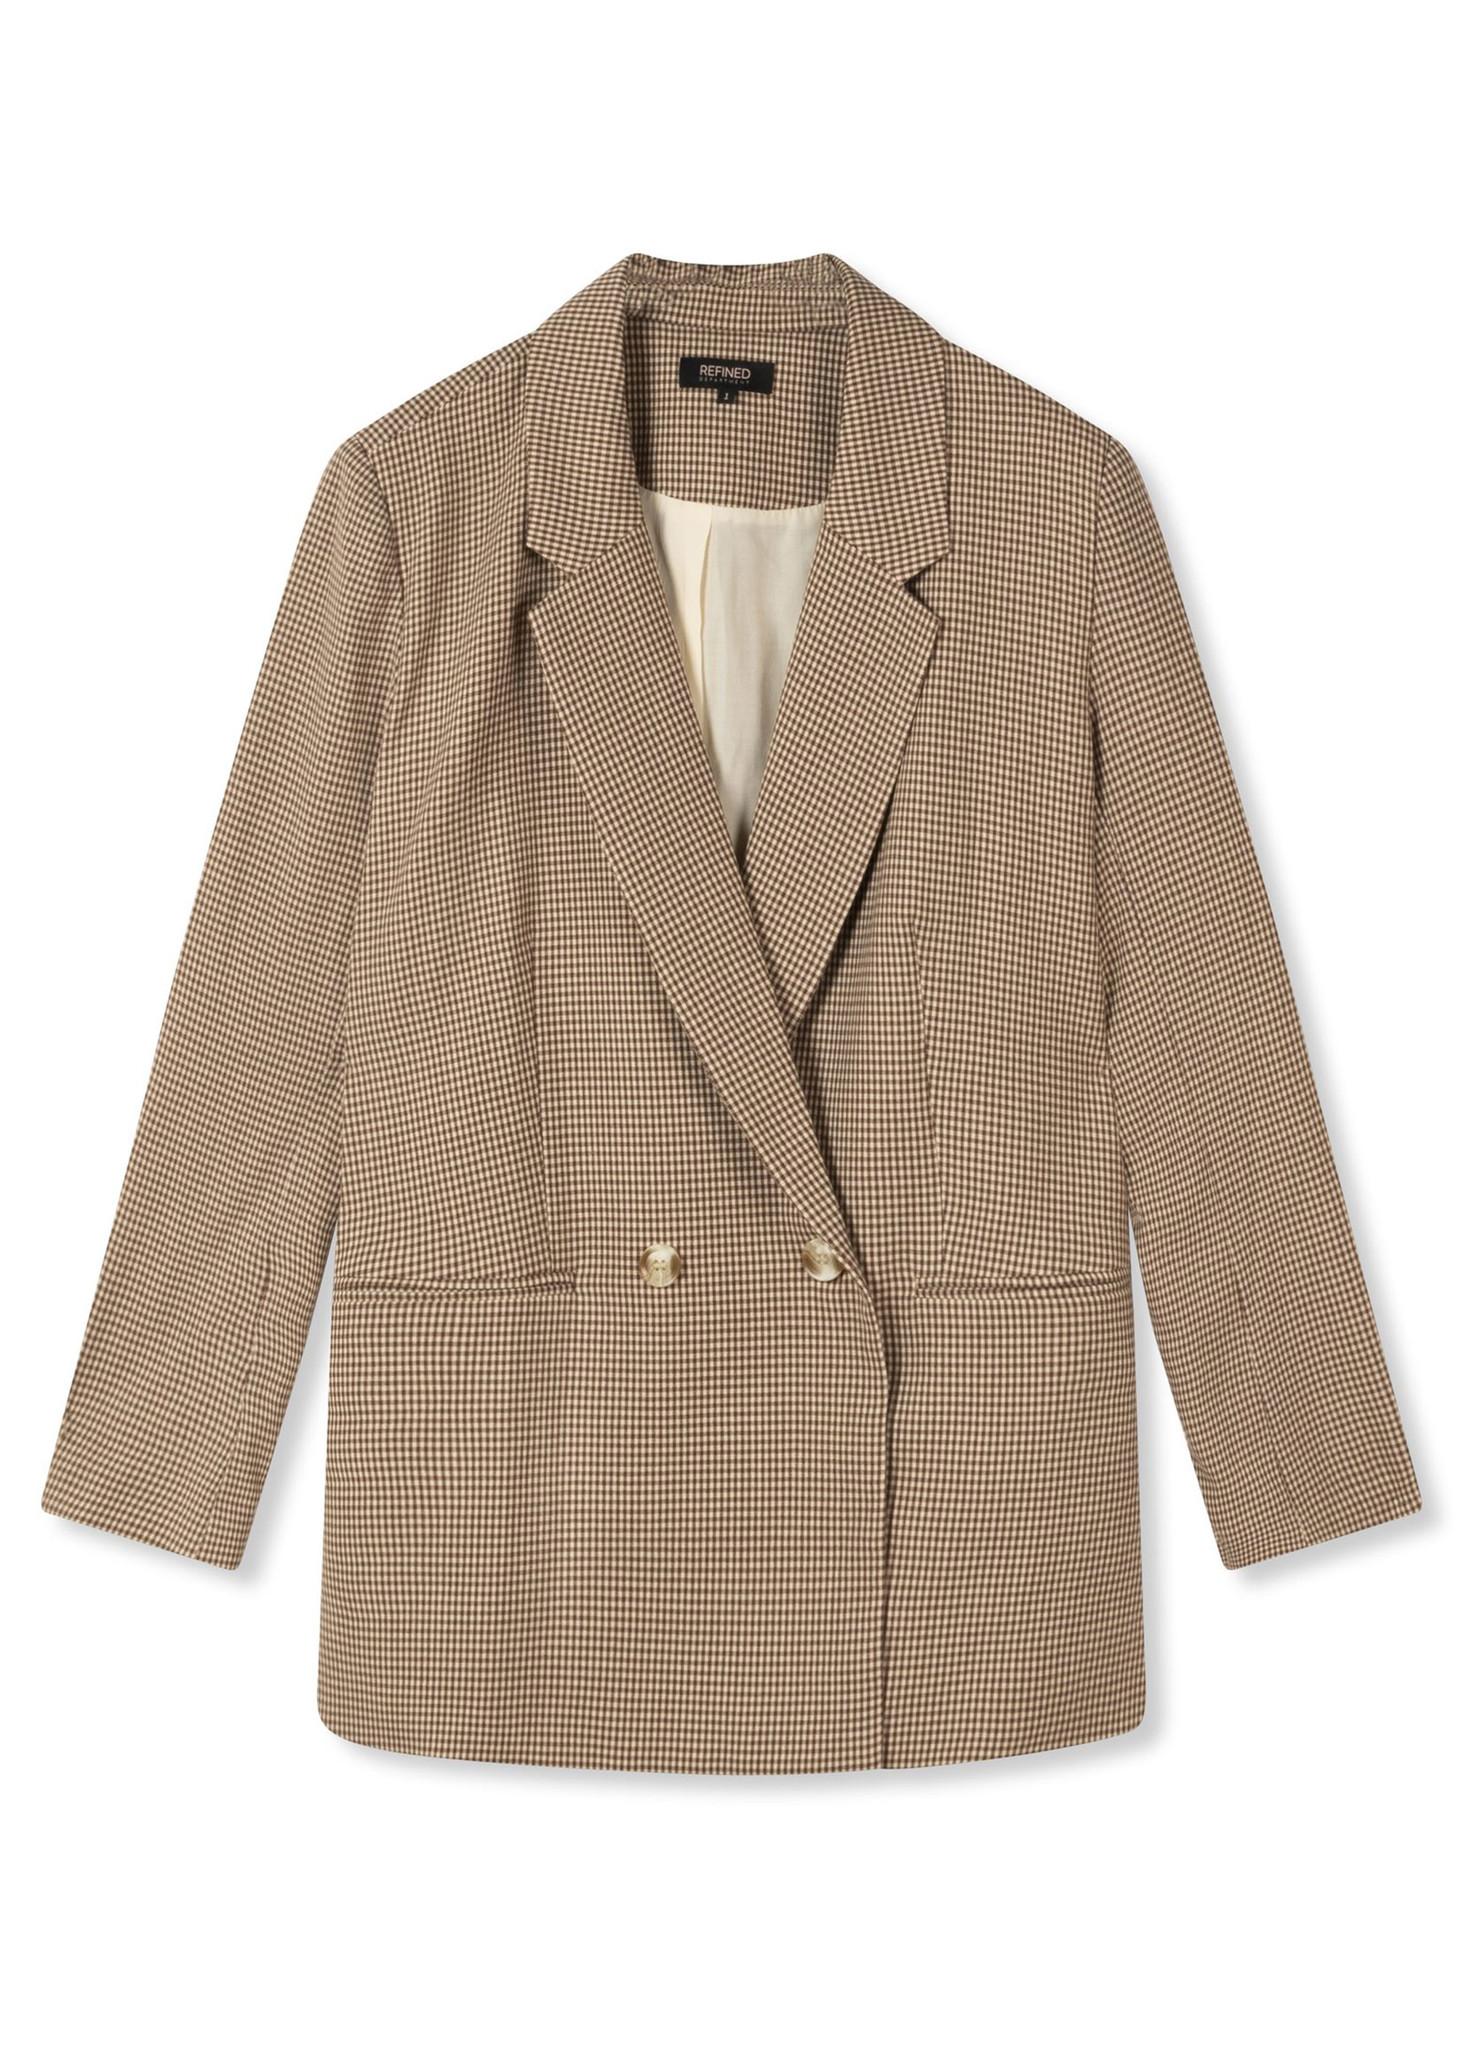 Woven Check Blazer Brown-5